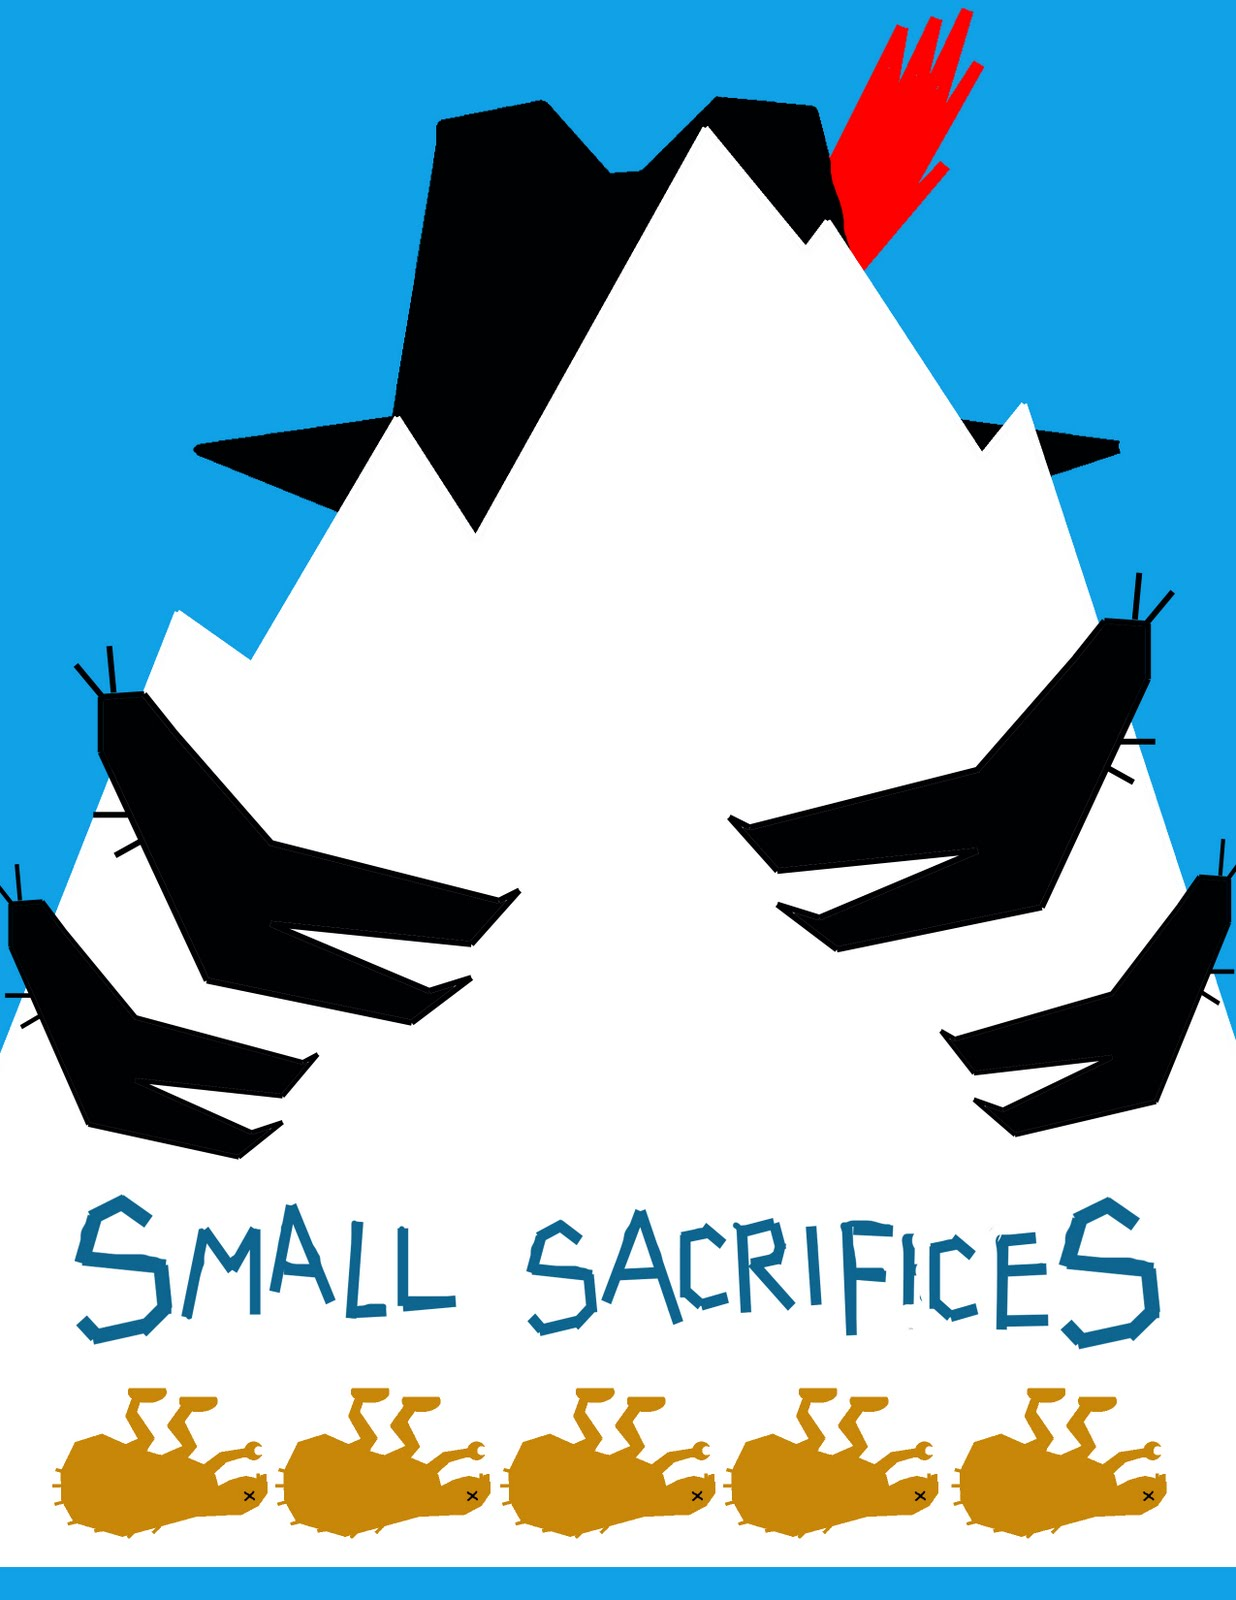 Small Sacrifices Storyboard